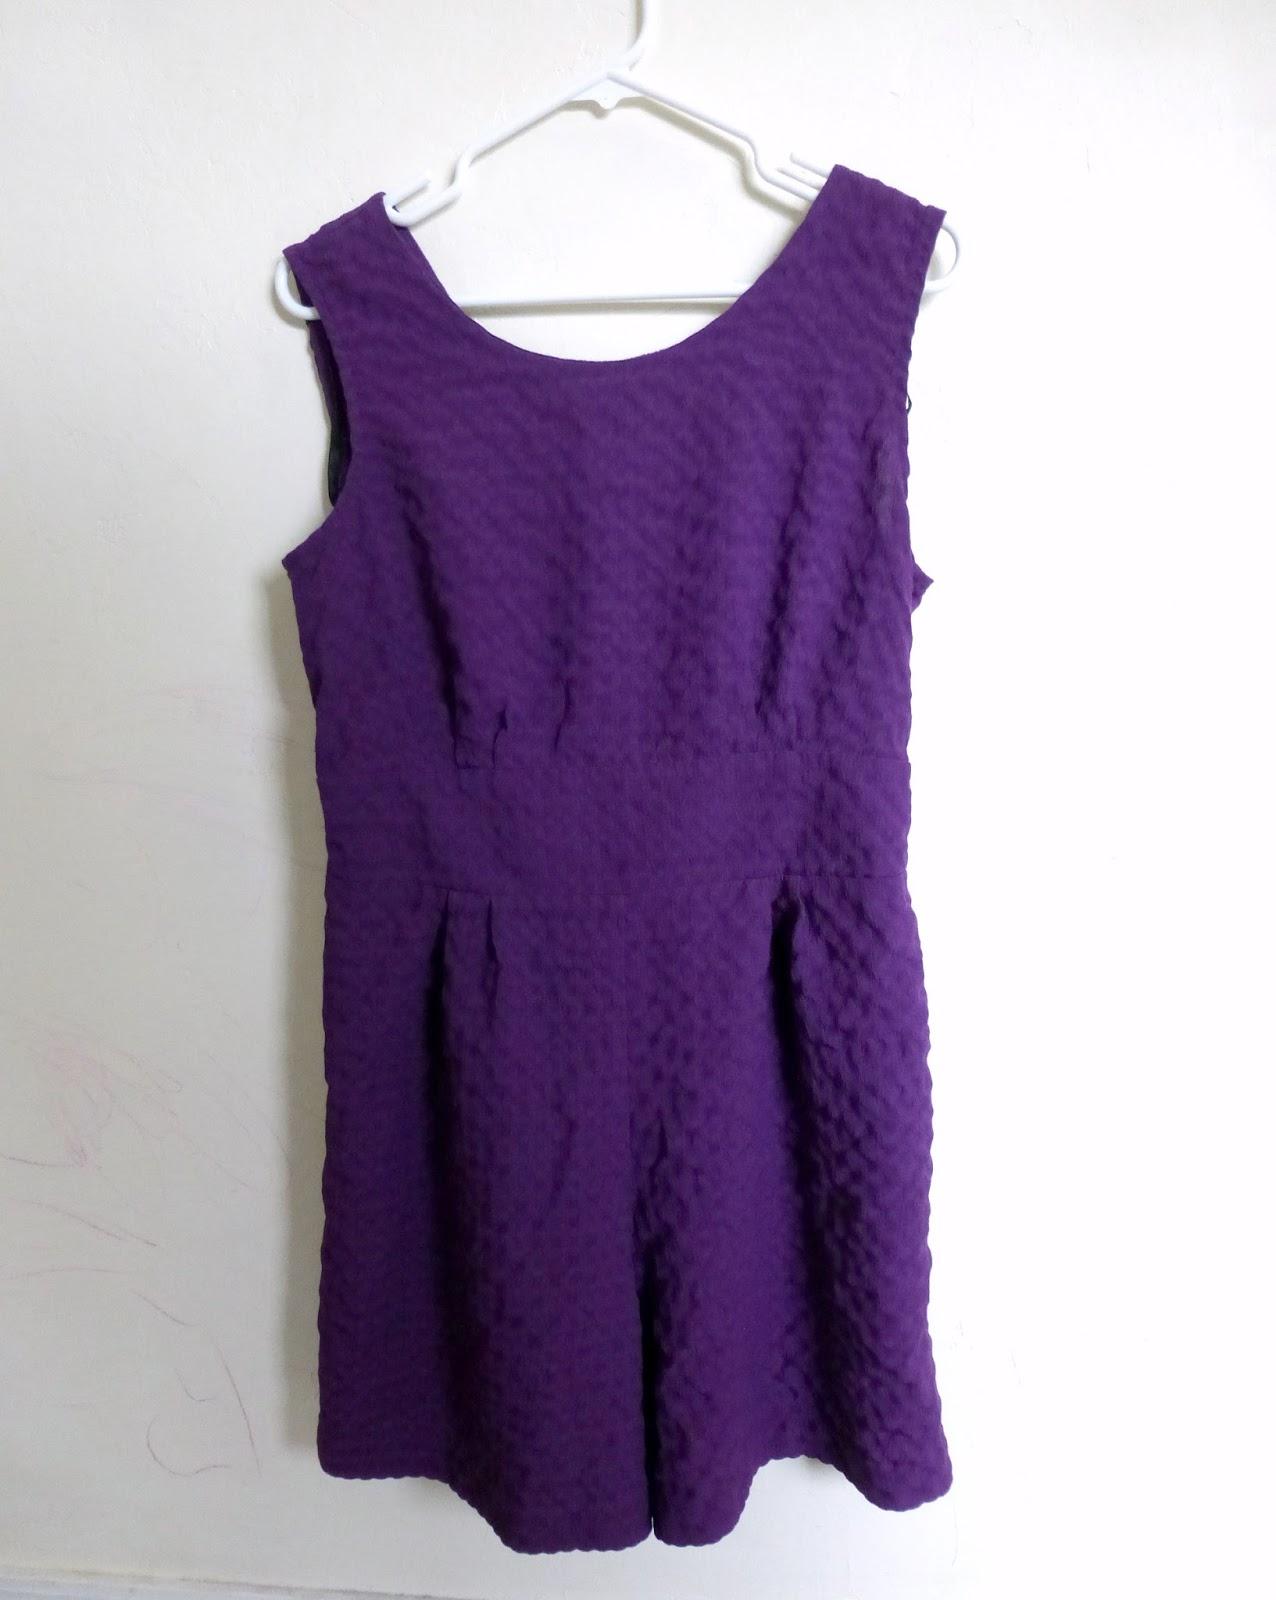 romper to purple dress refashion